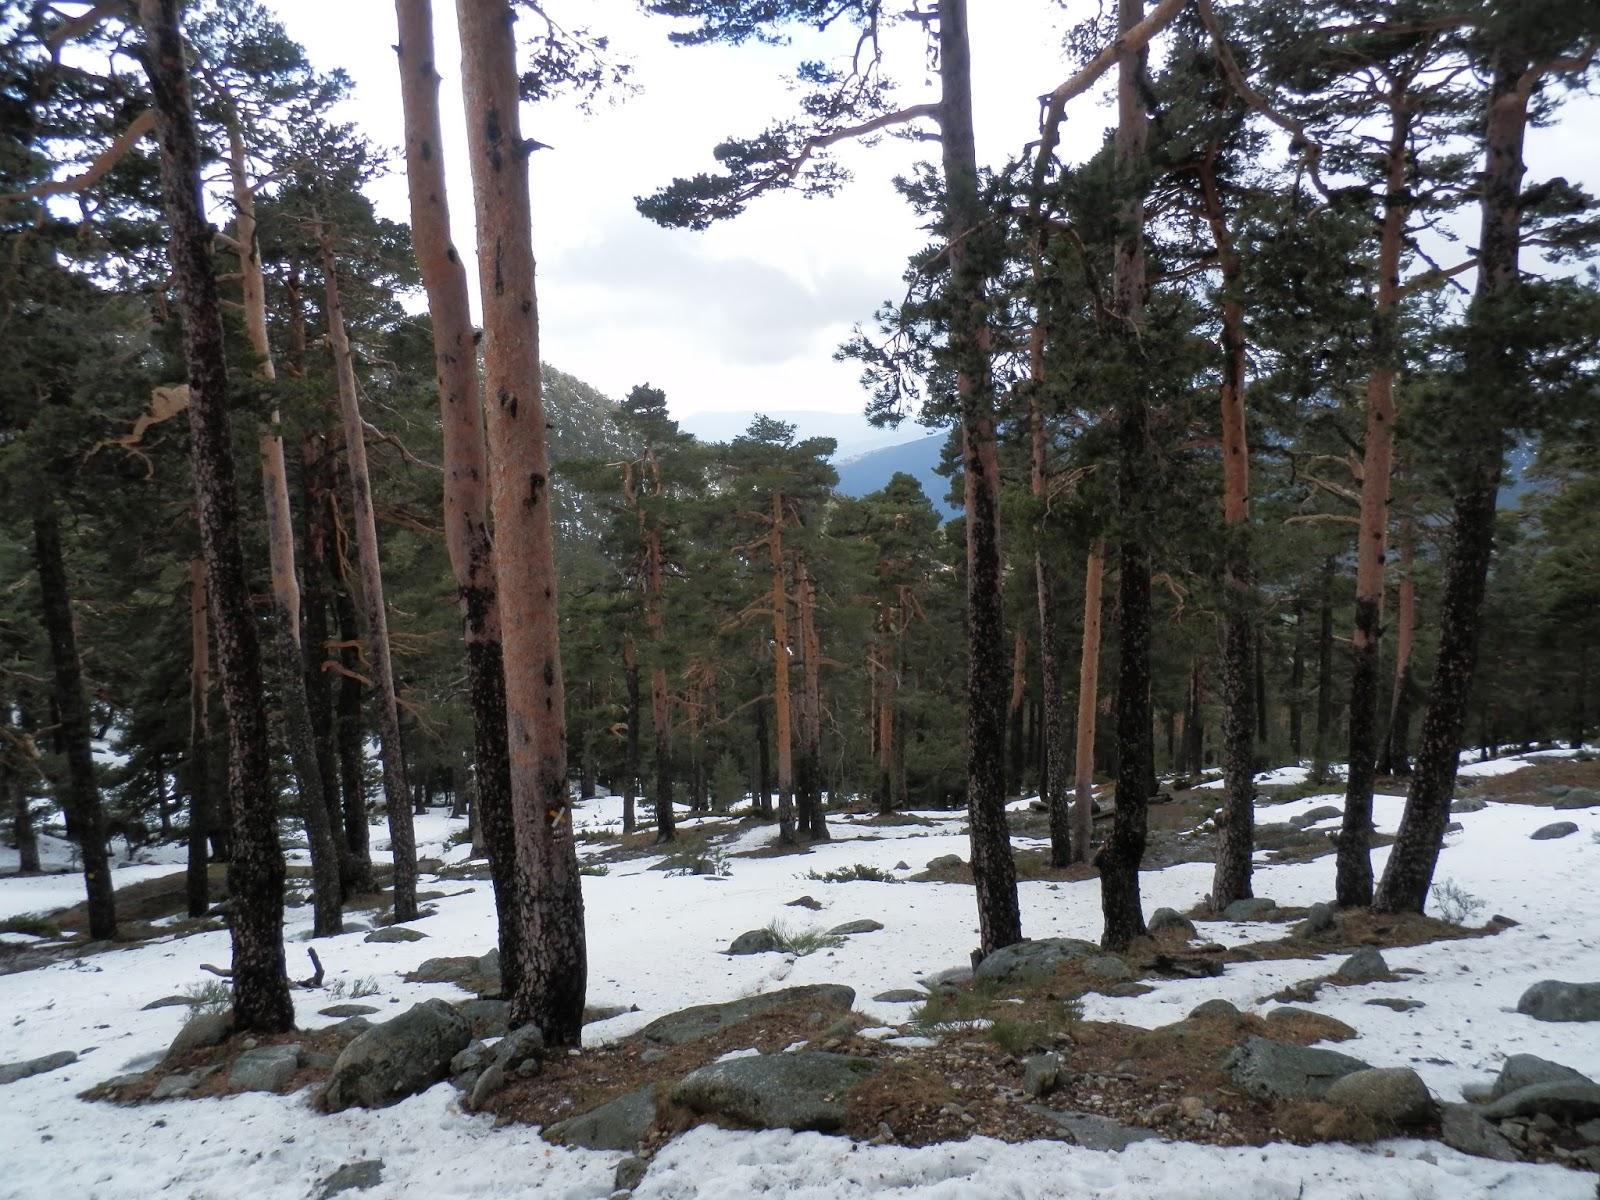 Imagen-del-pinar-nevado-en-la-ruta-del-Camino-Schmidt